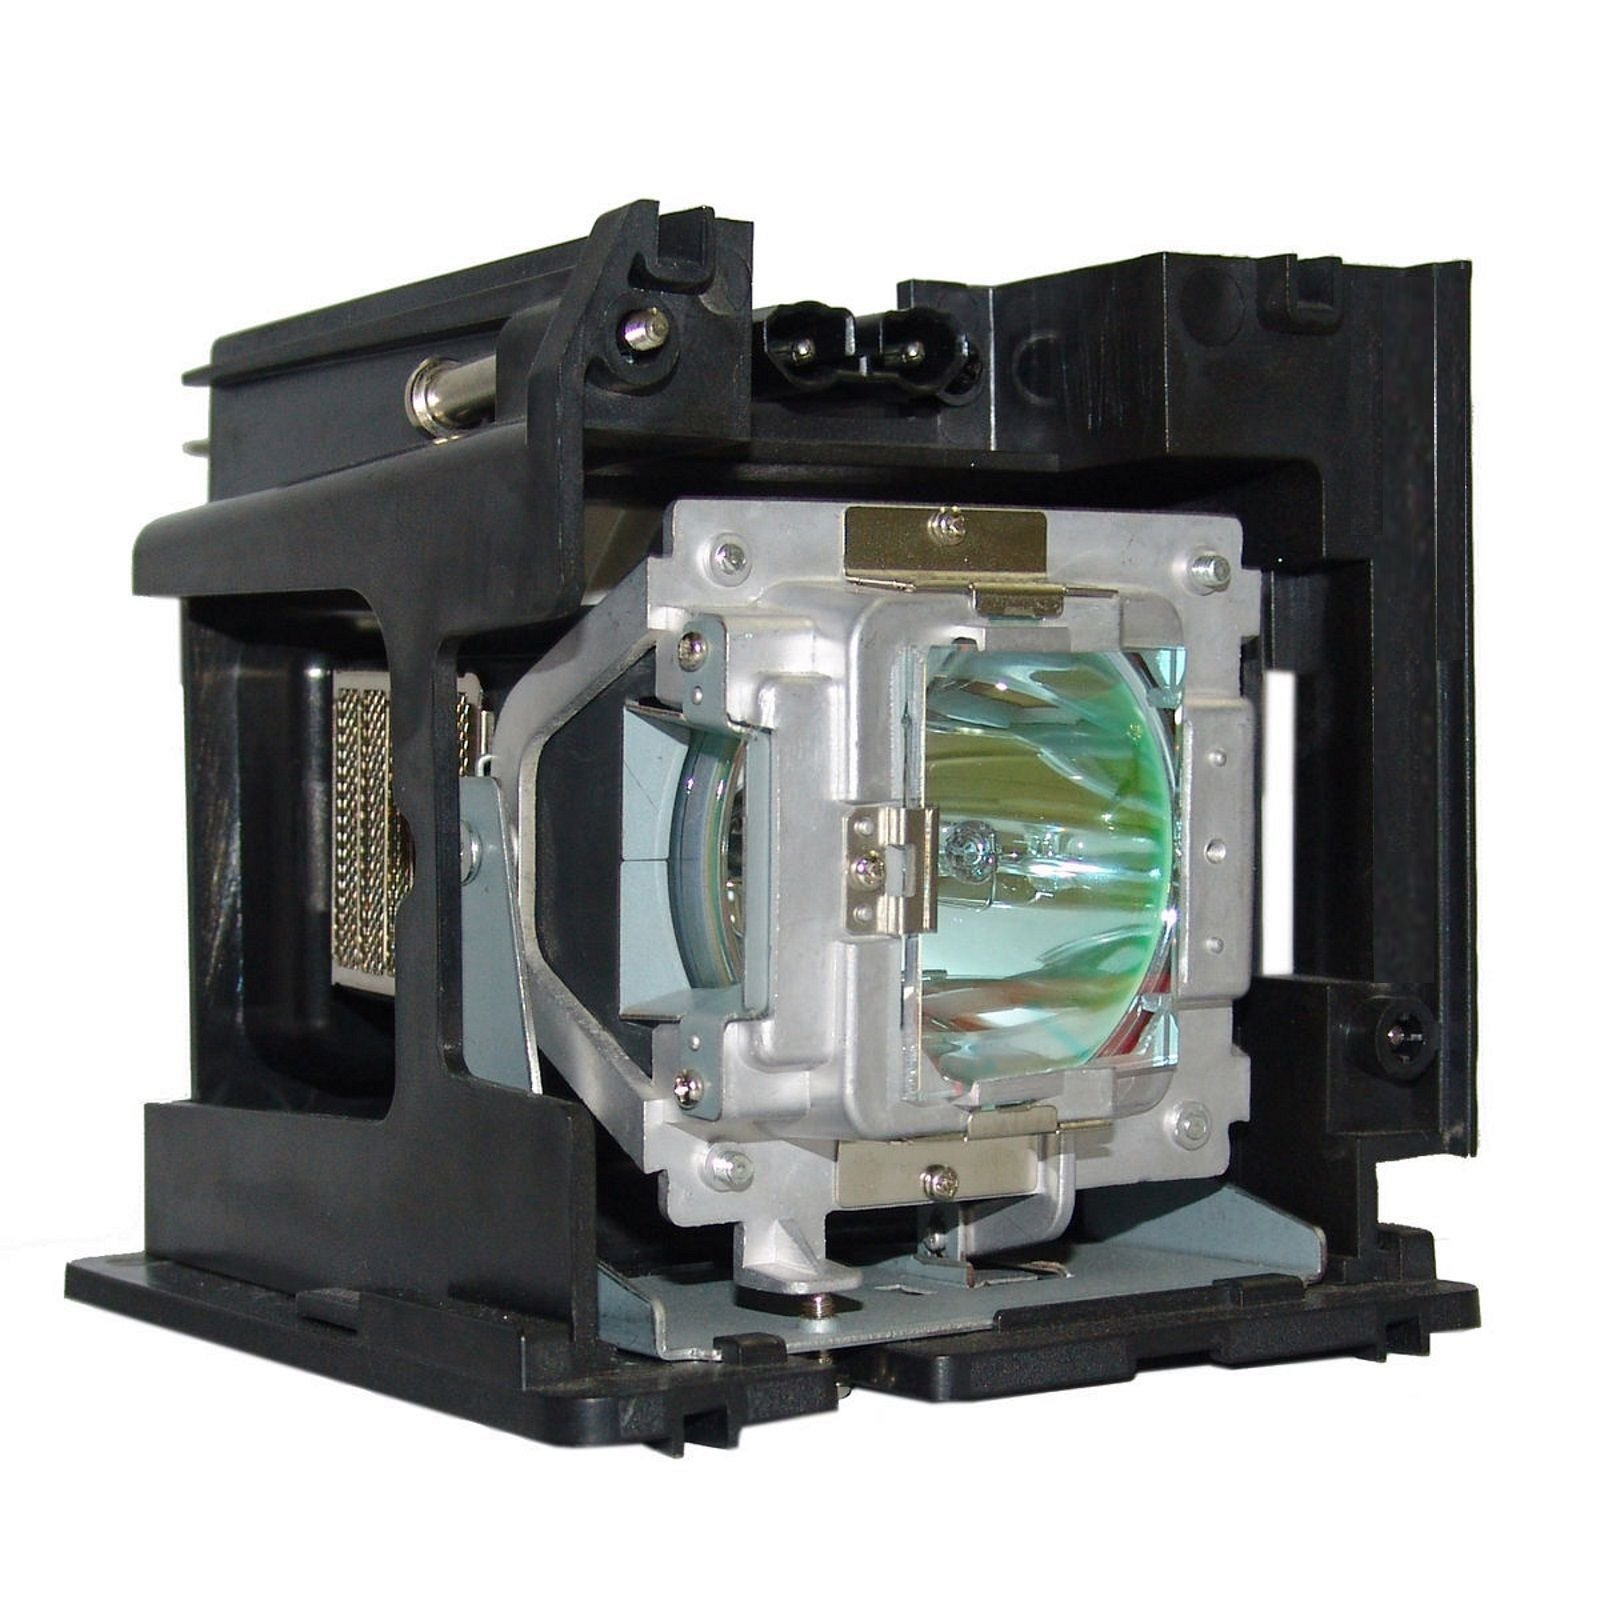 OPTOMA DE 5811116283 DE5811116283 LAMP IN HOUSING FOR PROJECTOR MODEL TX7855